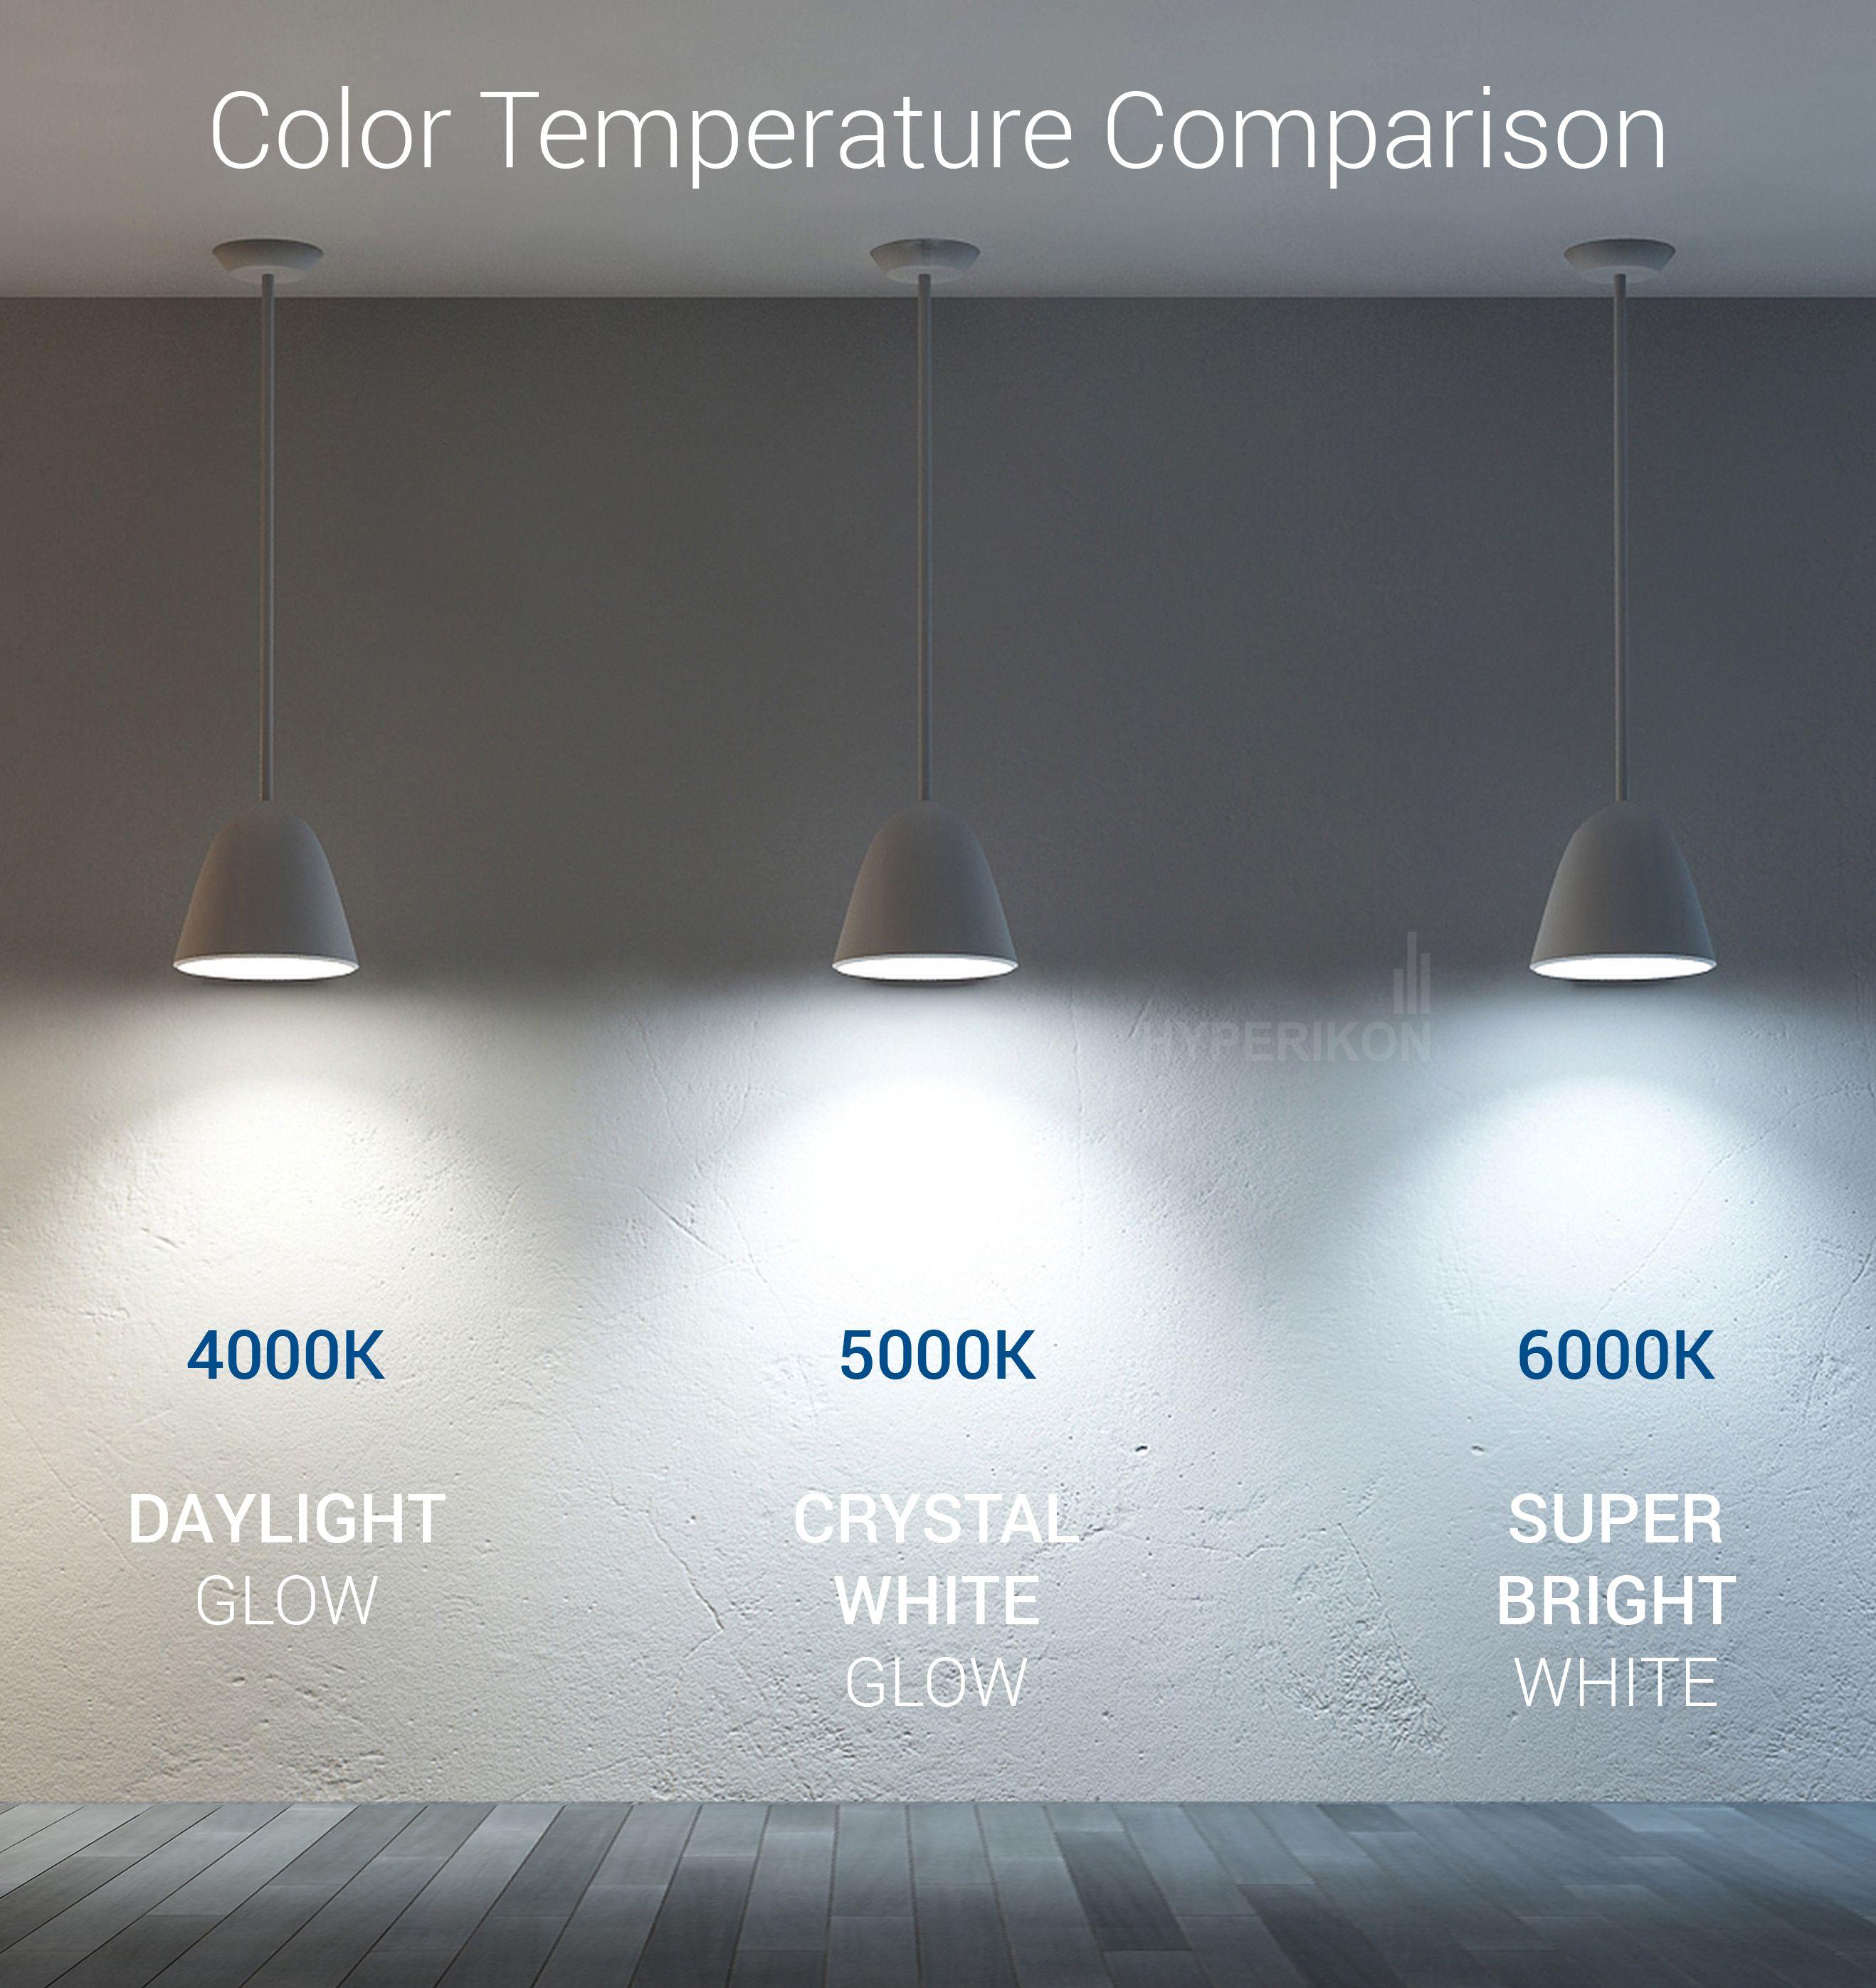 Led Color Temperature In 2020 Bar Lighting Design Lighting Design Interior Ceiling Light Design